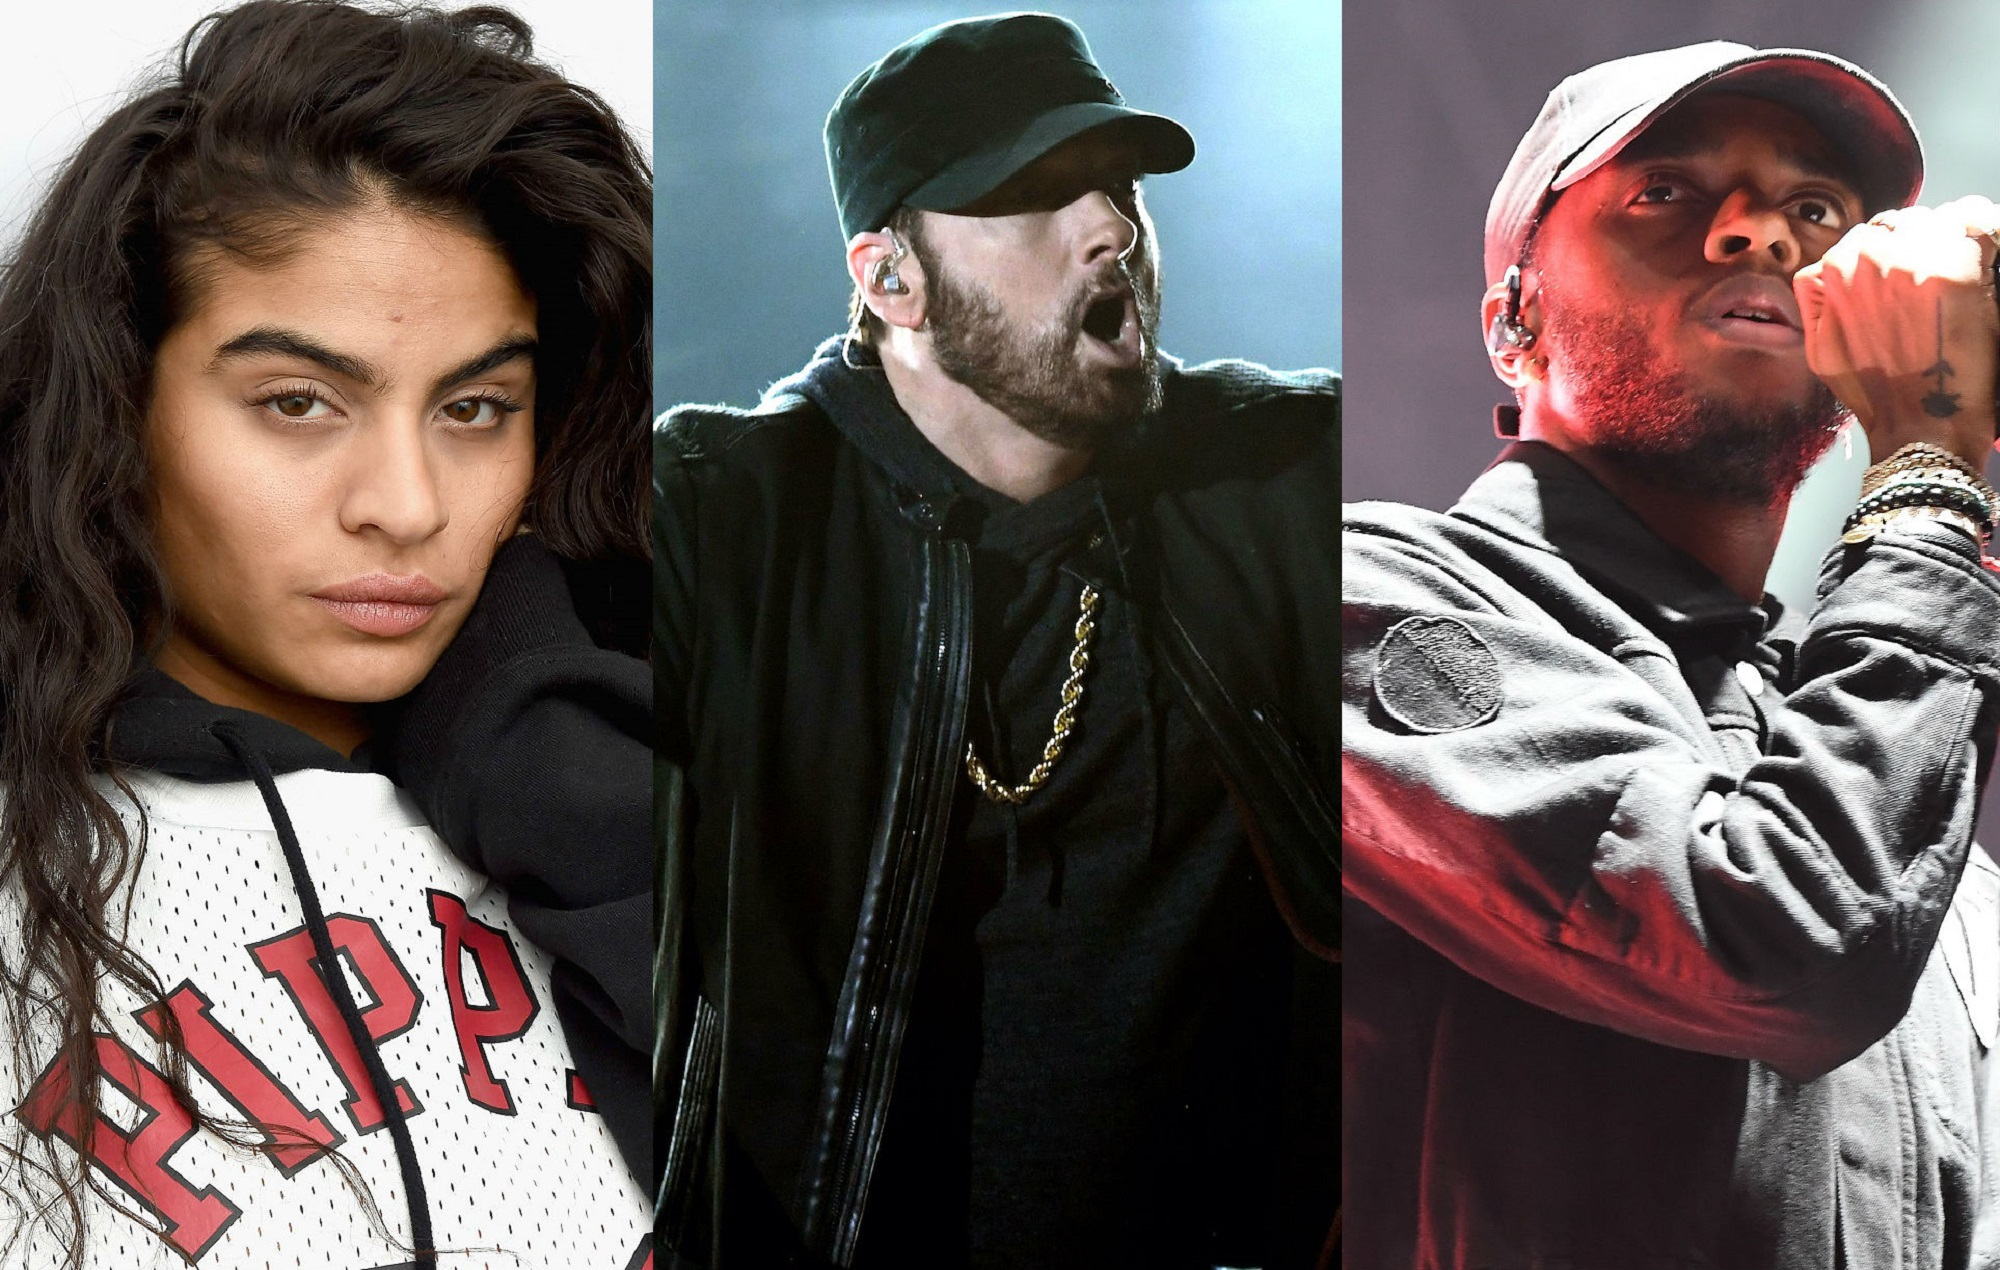 Jessie Reyez teams up with Eminem and 6LACK on her debut album - EpicNews